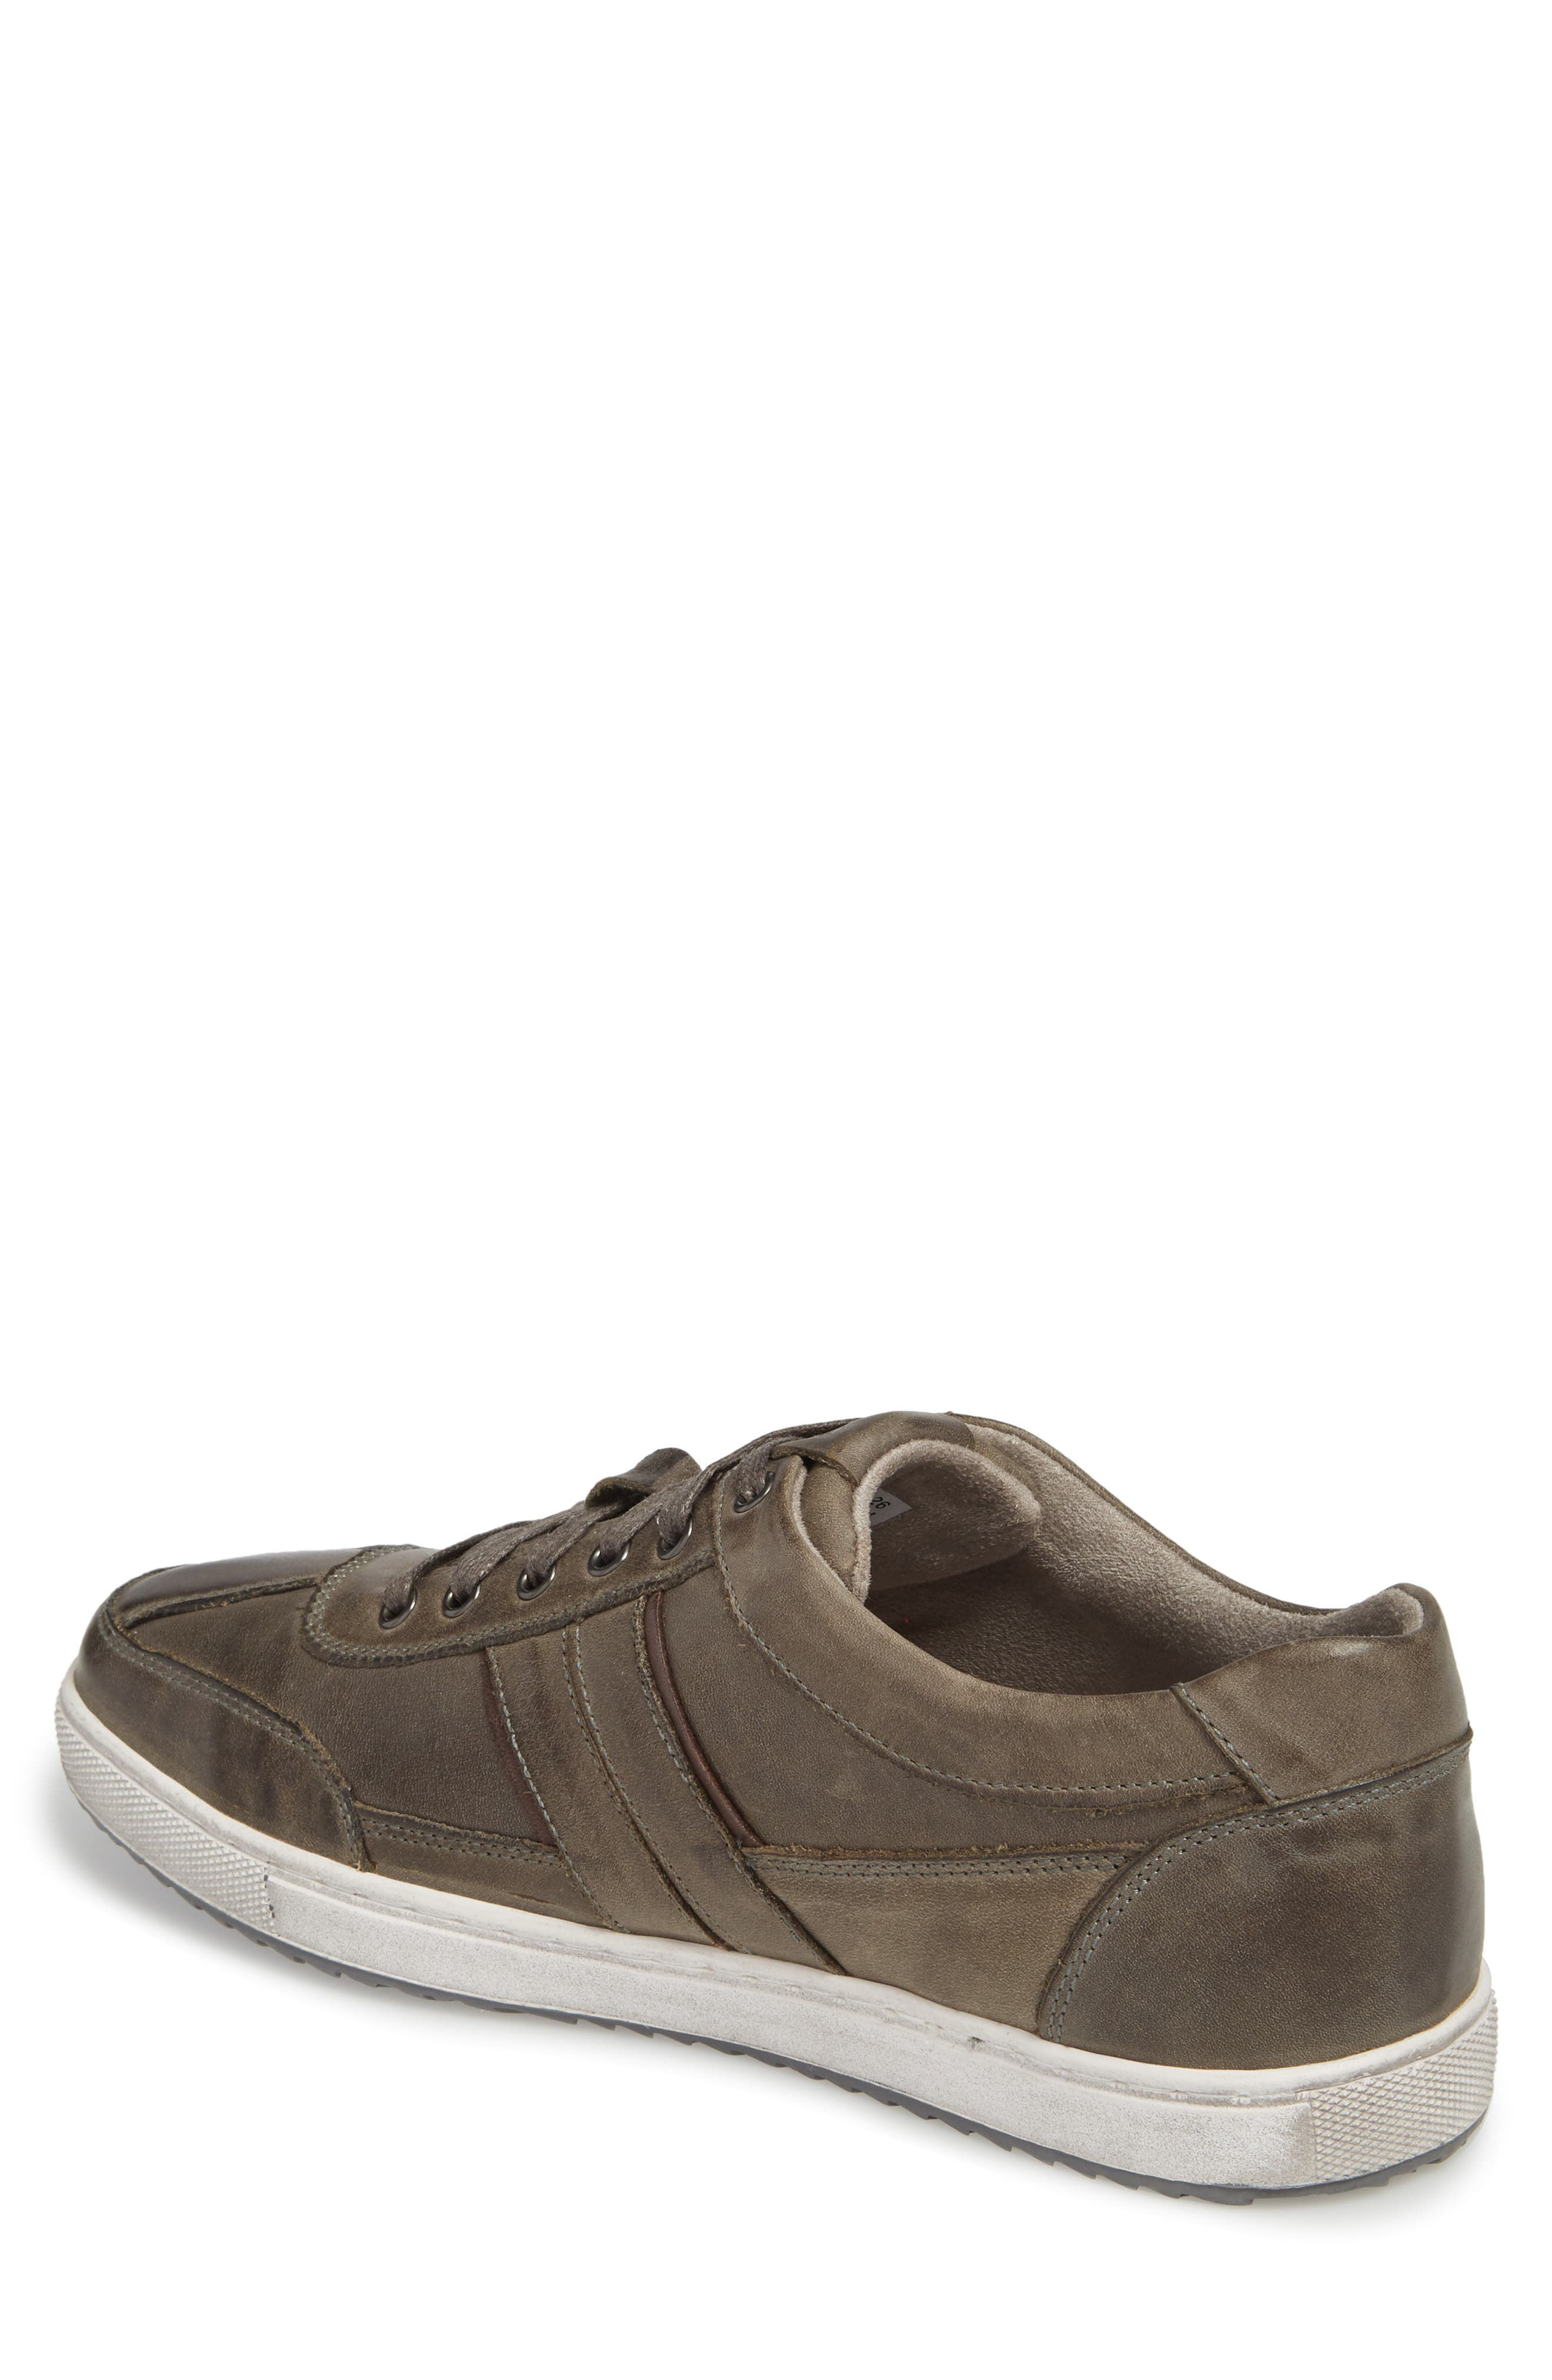 Sprinter Low Top Sneaker,                             Alternate thumbnail 2, color,                             Grey